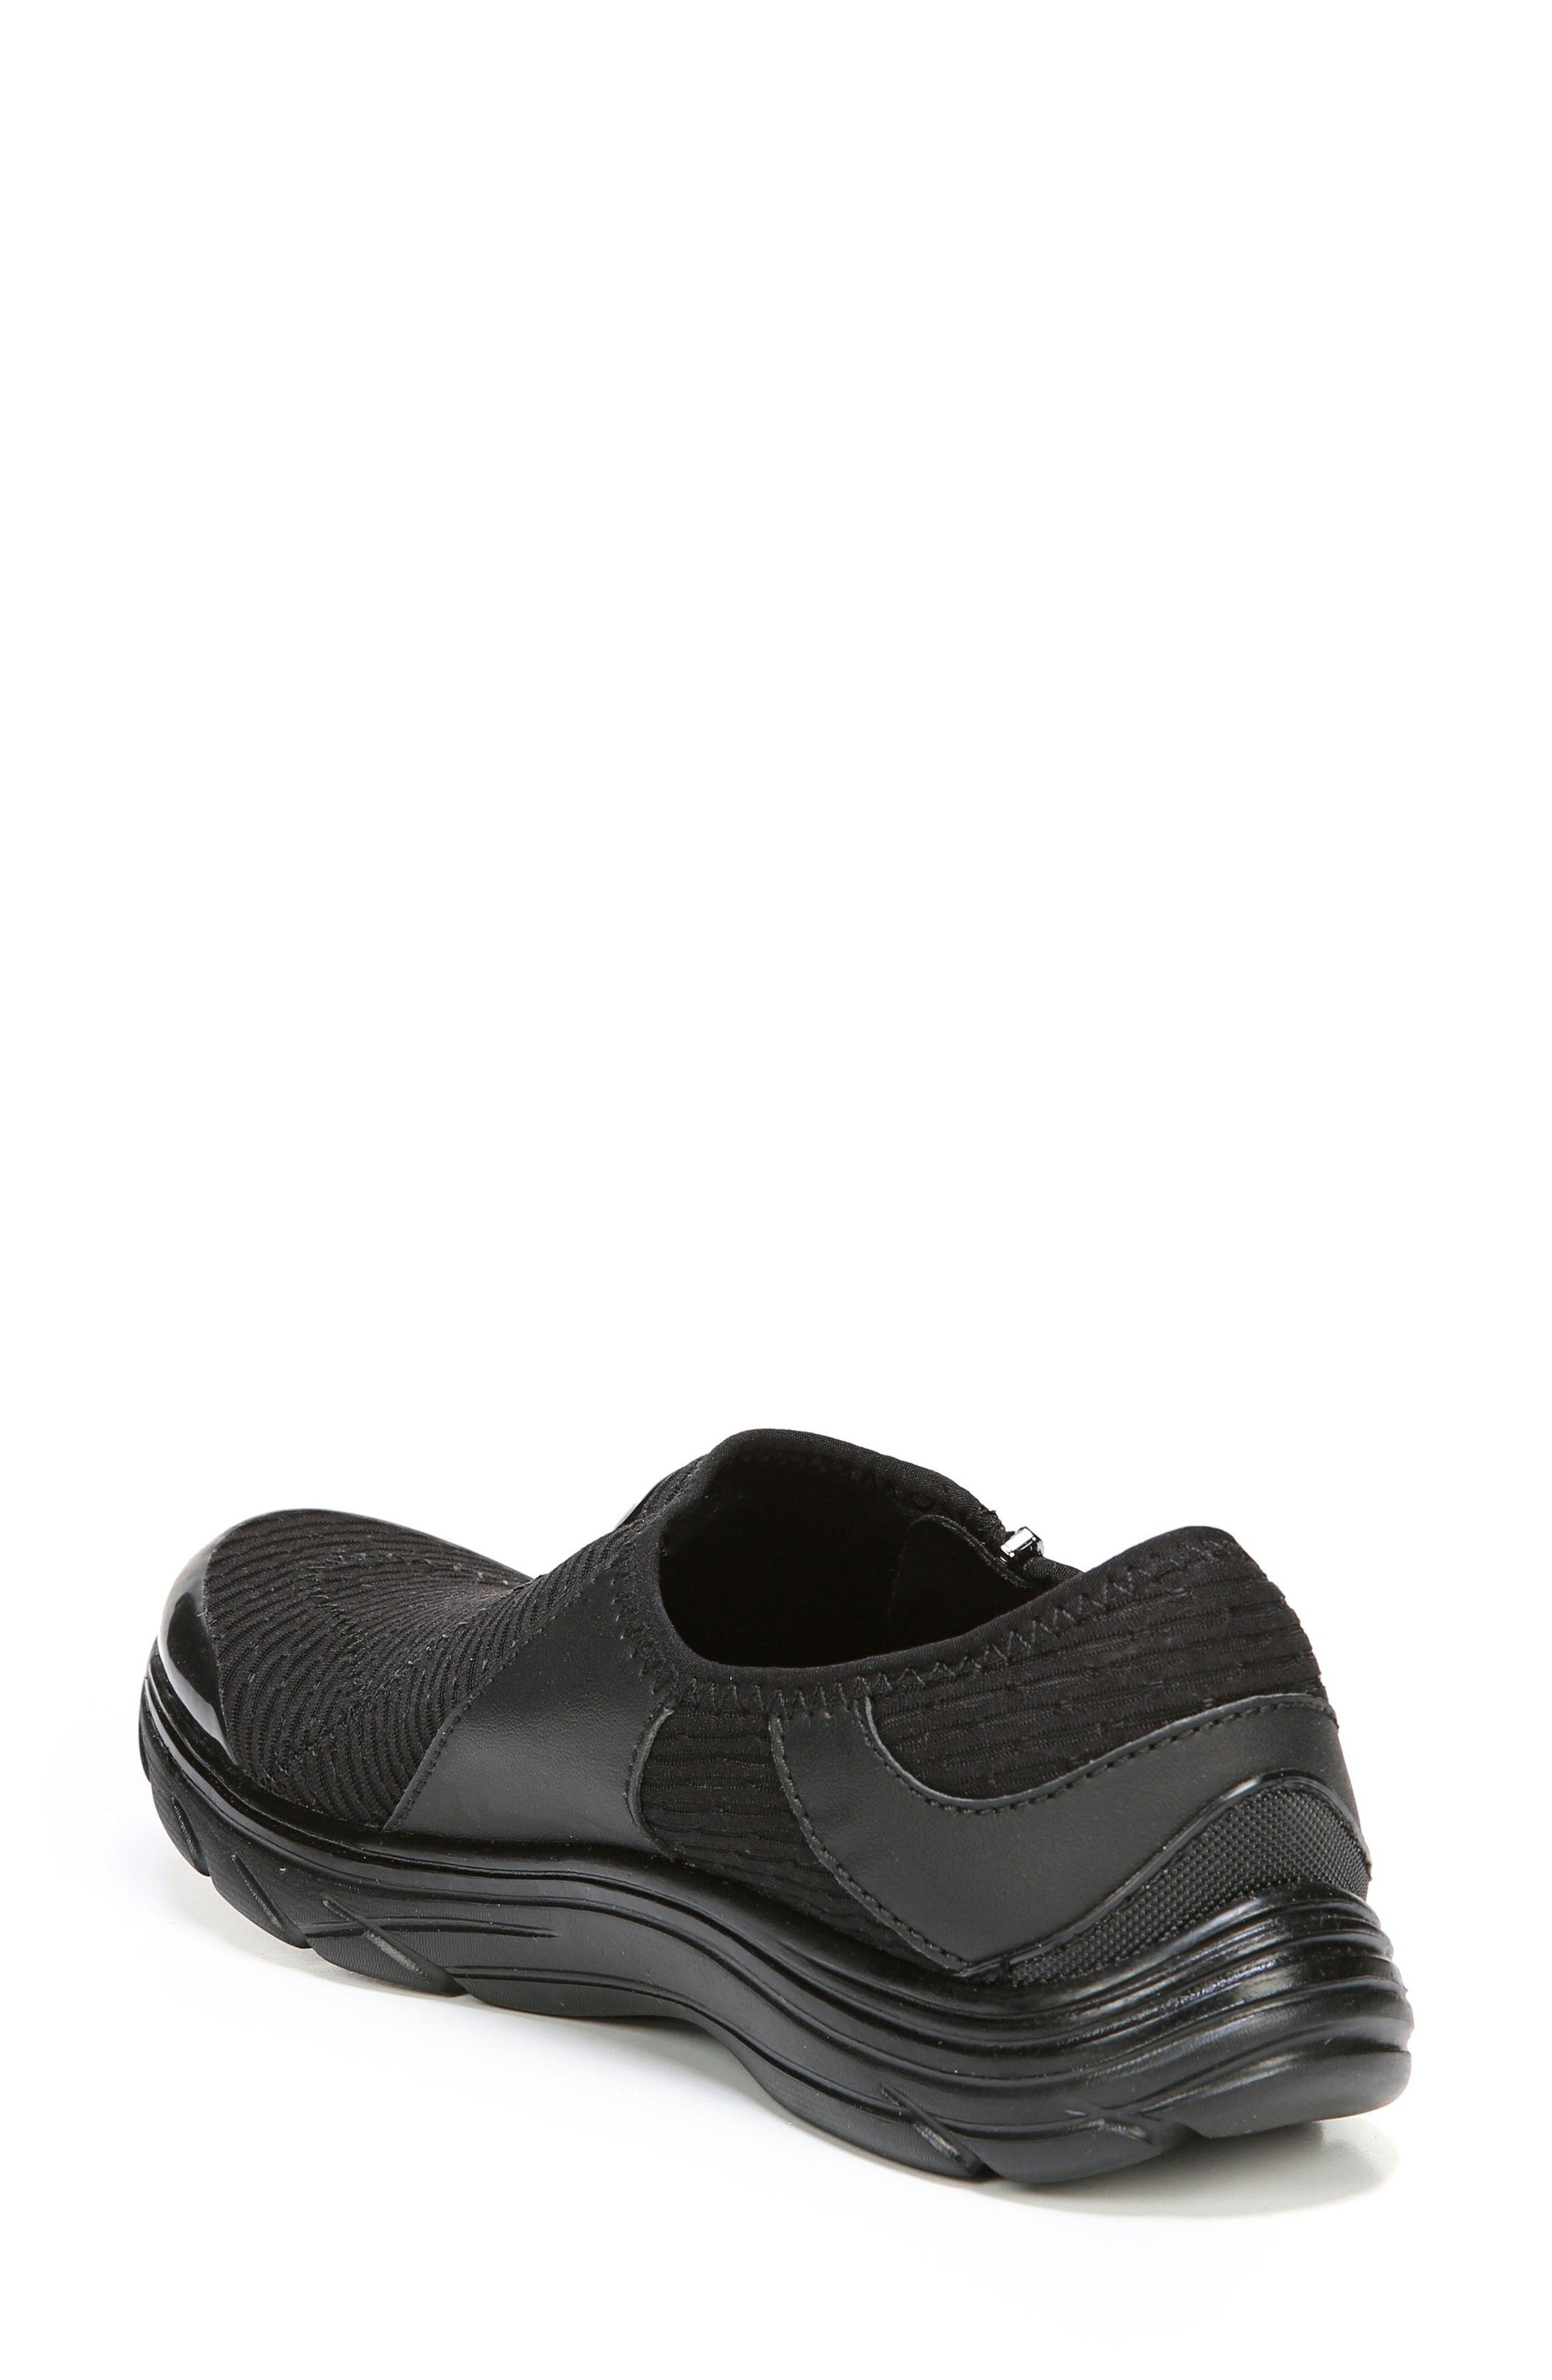 Balance Sneaker,                             Alternate thumbnail 3, color,